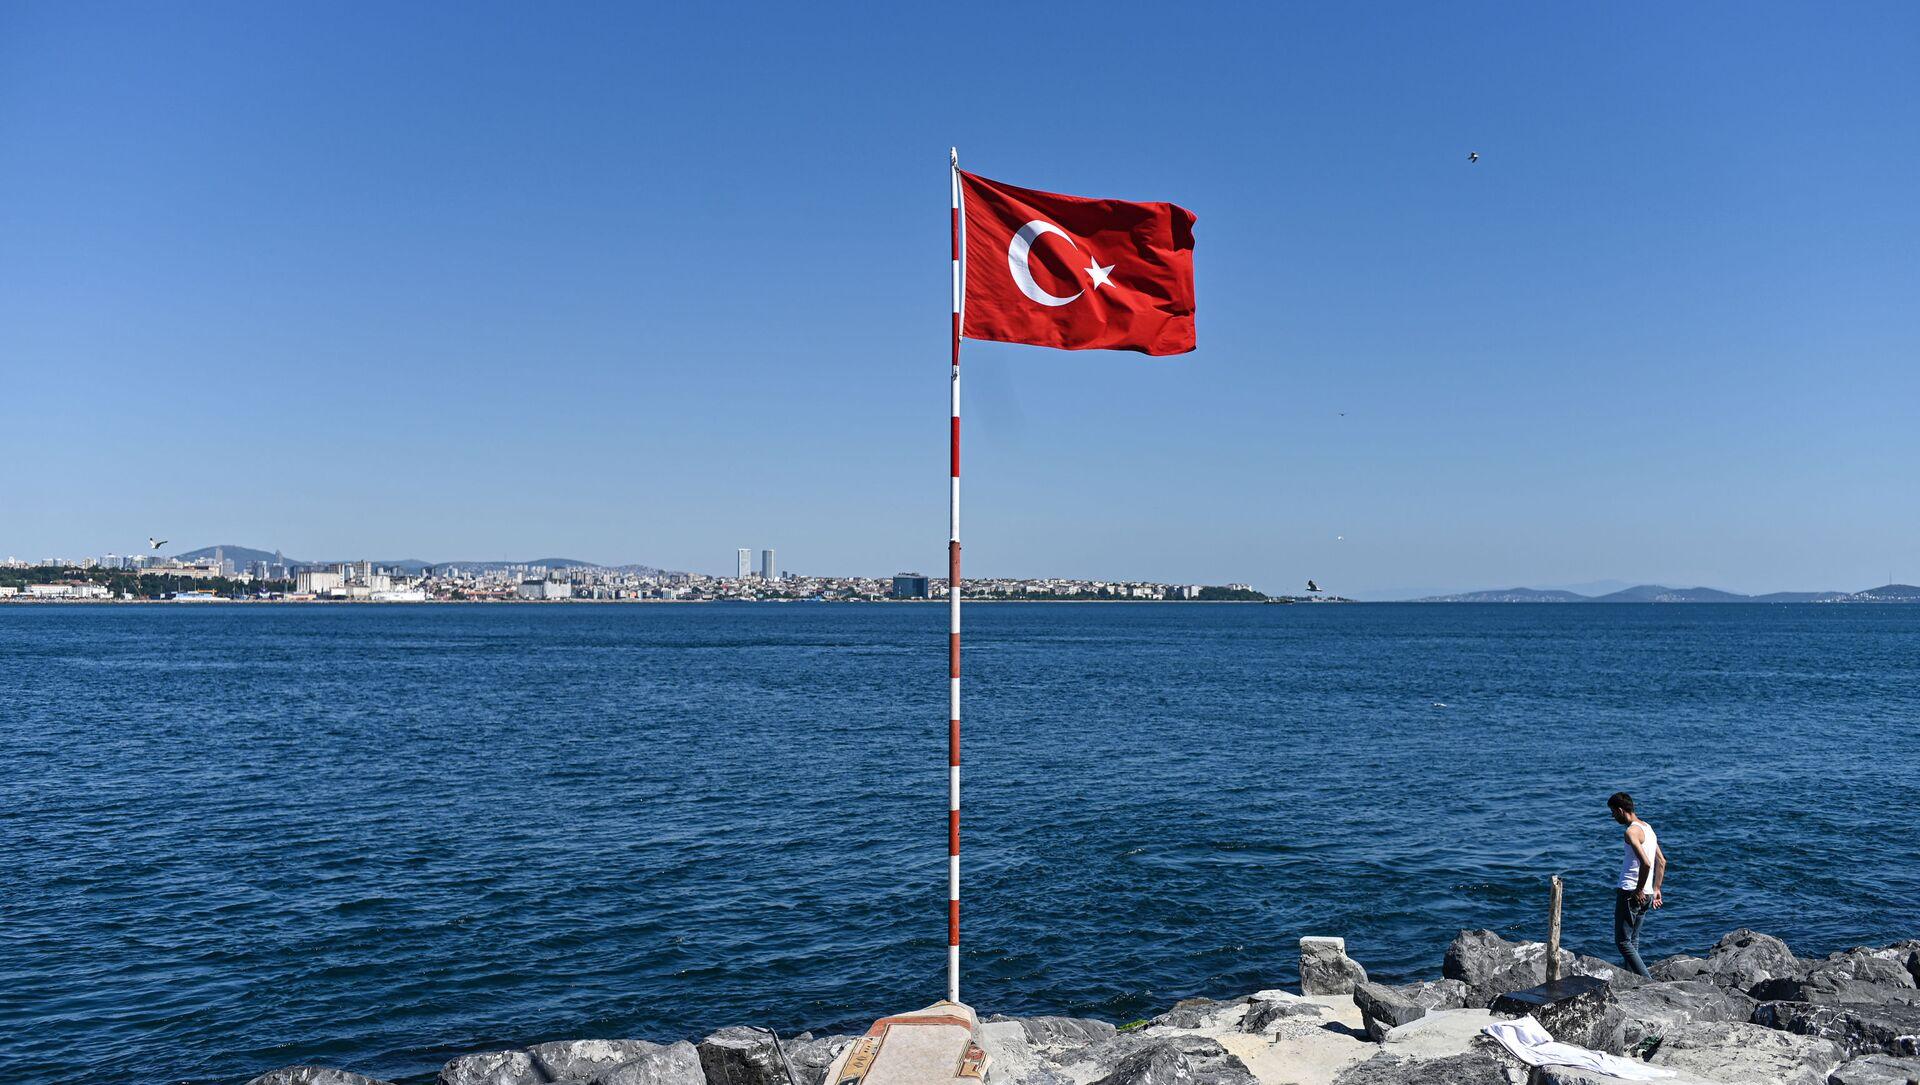 Флаг Турции, фото из архива - Sputnik Azərbaycan, 1920, 05.05.2021